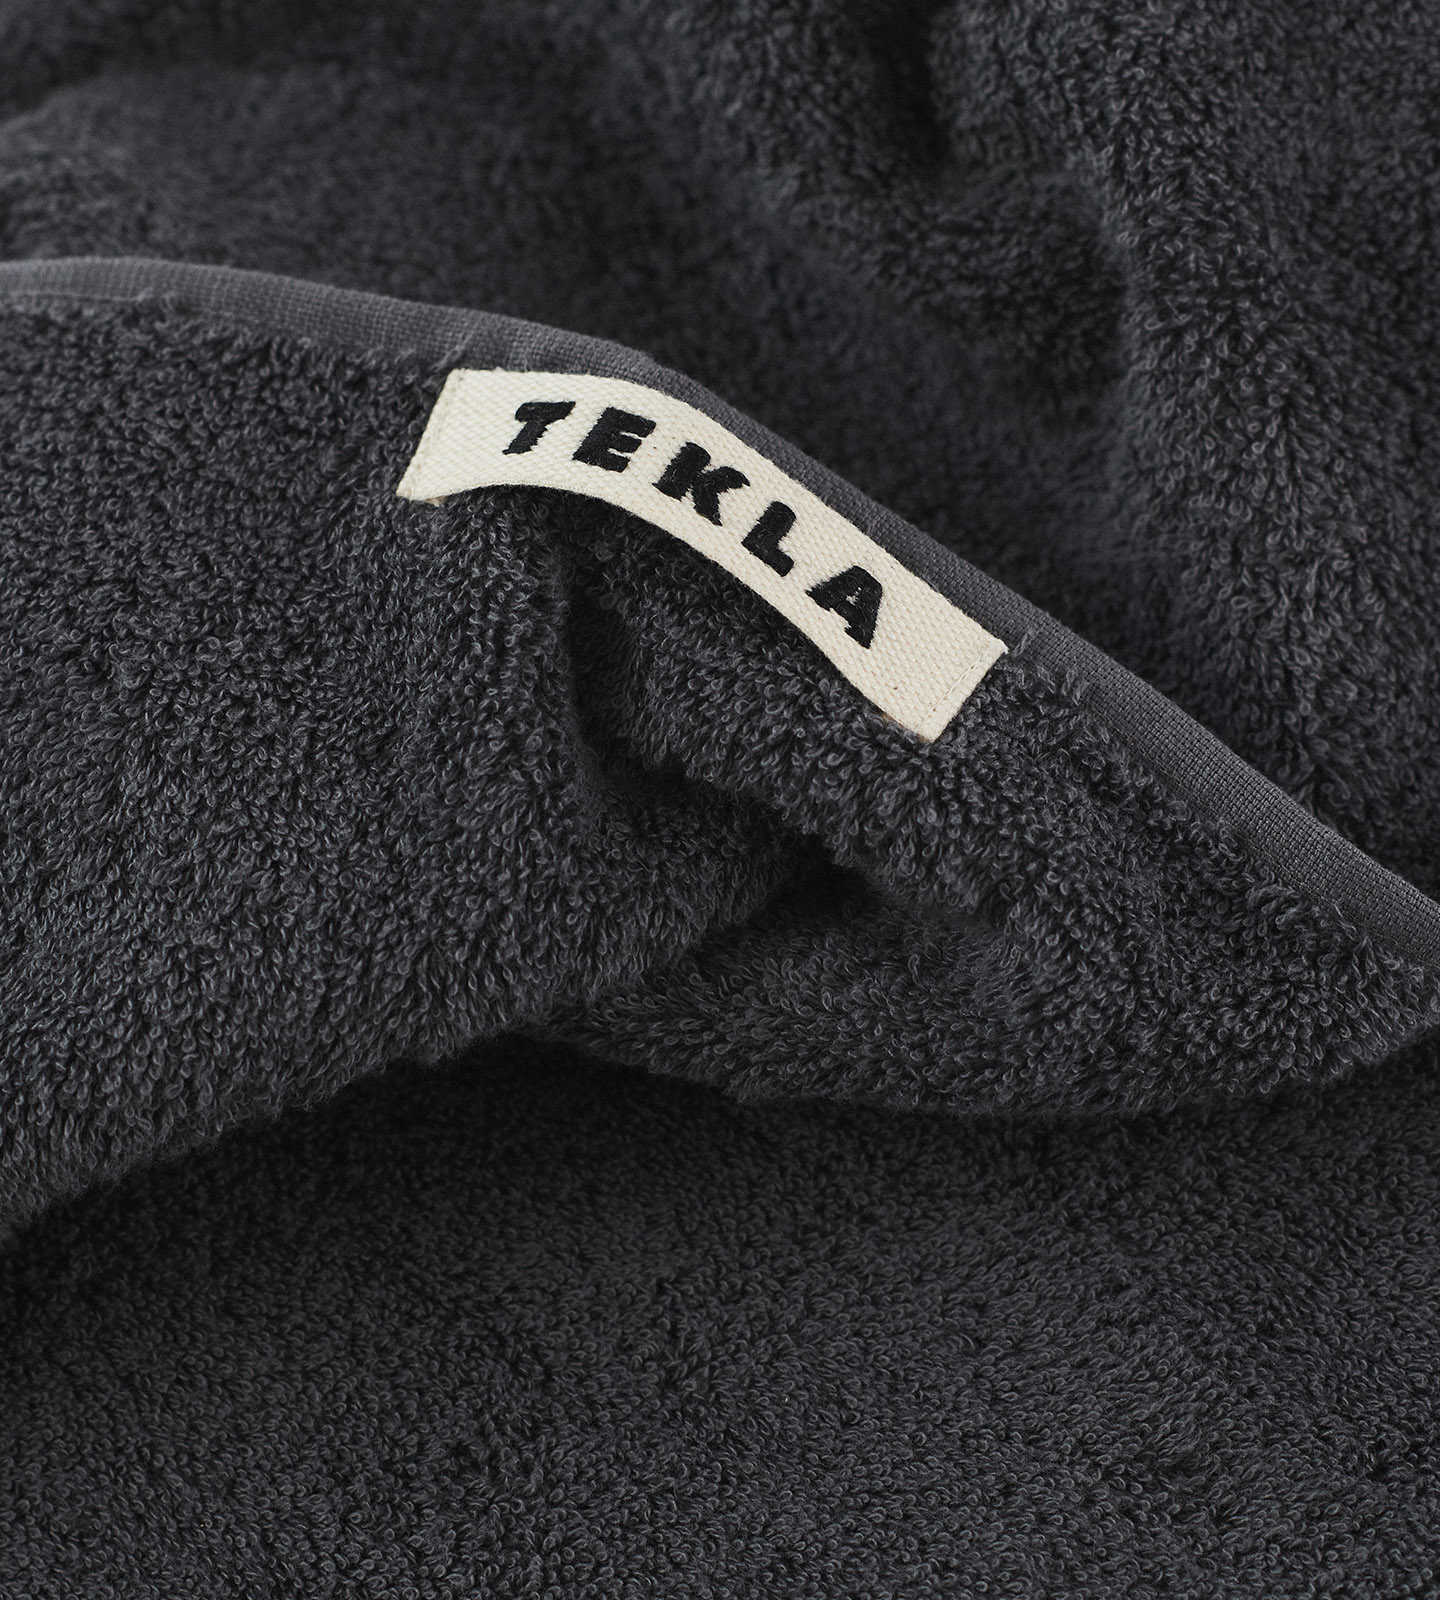 Tekla Organic Terry Towel - Charcoal Grey